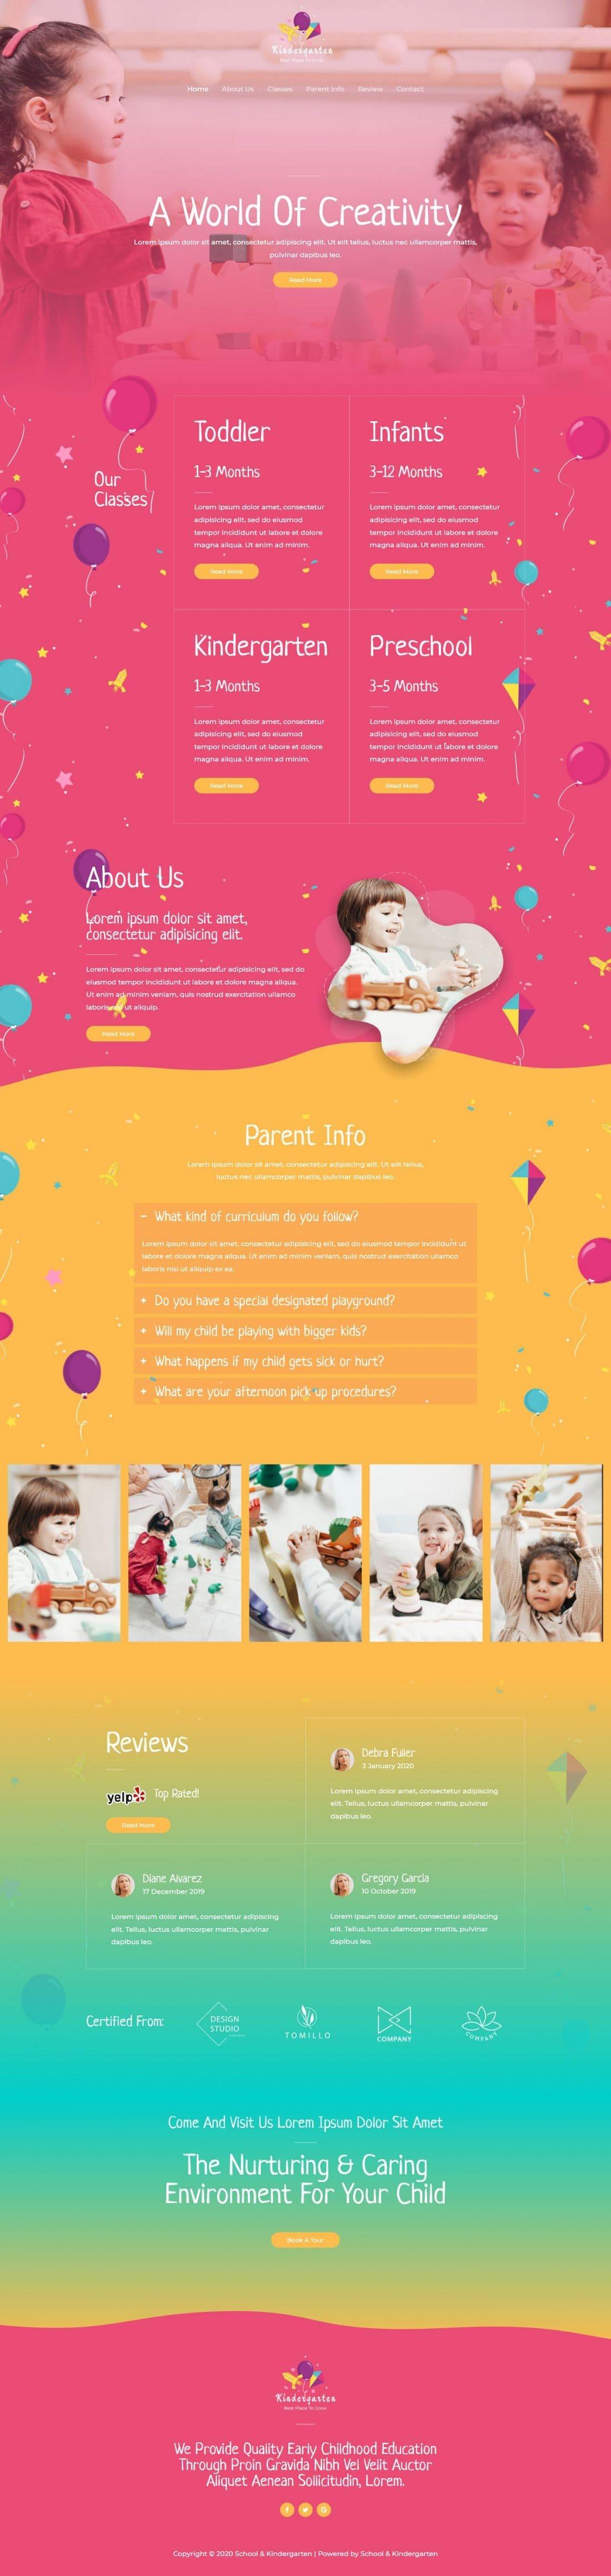 Fagowi.com Website Design Templates For Kindergarten PreSchool - Home Page Image